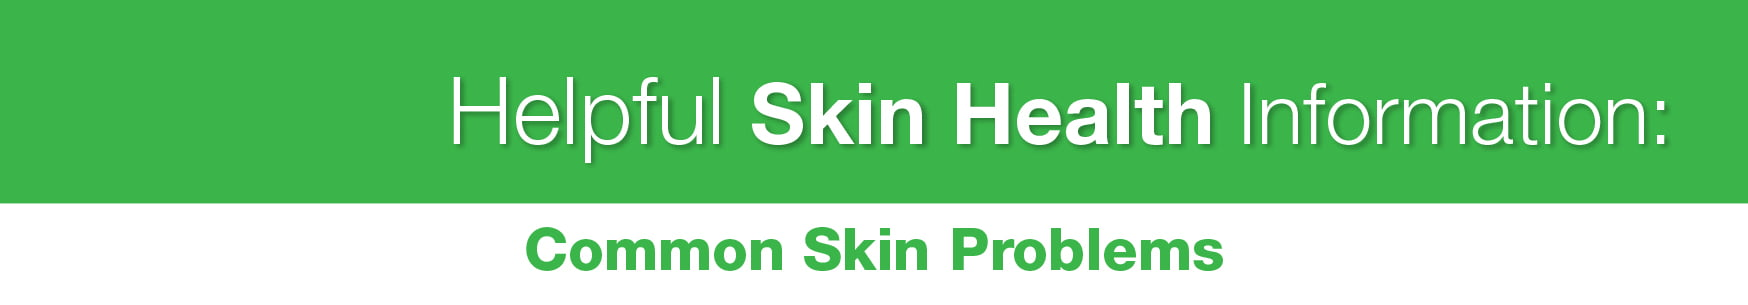 HealthSol_Skin_A5TipSheet